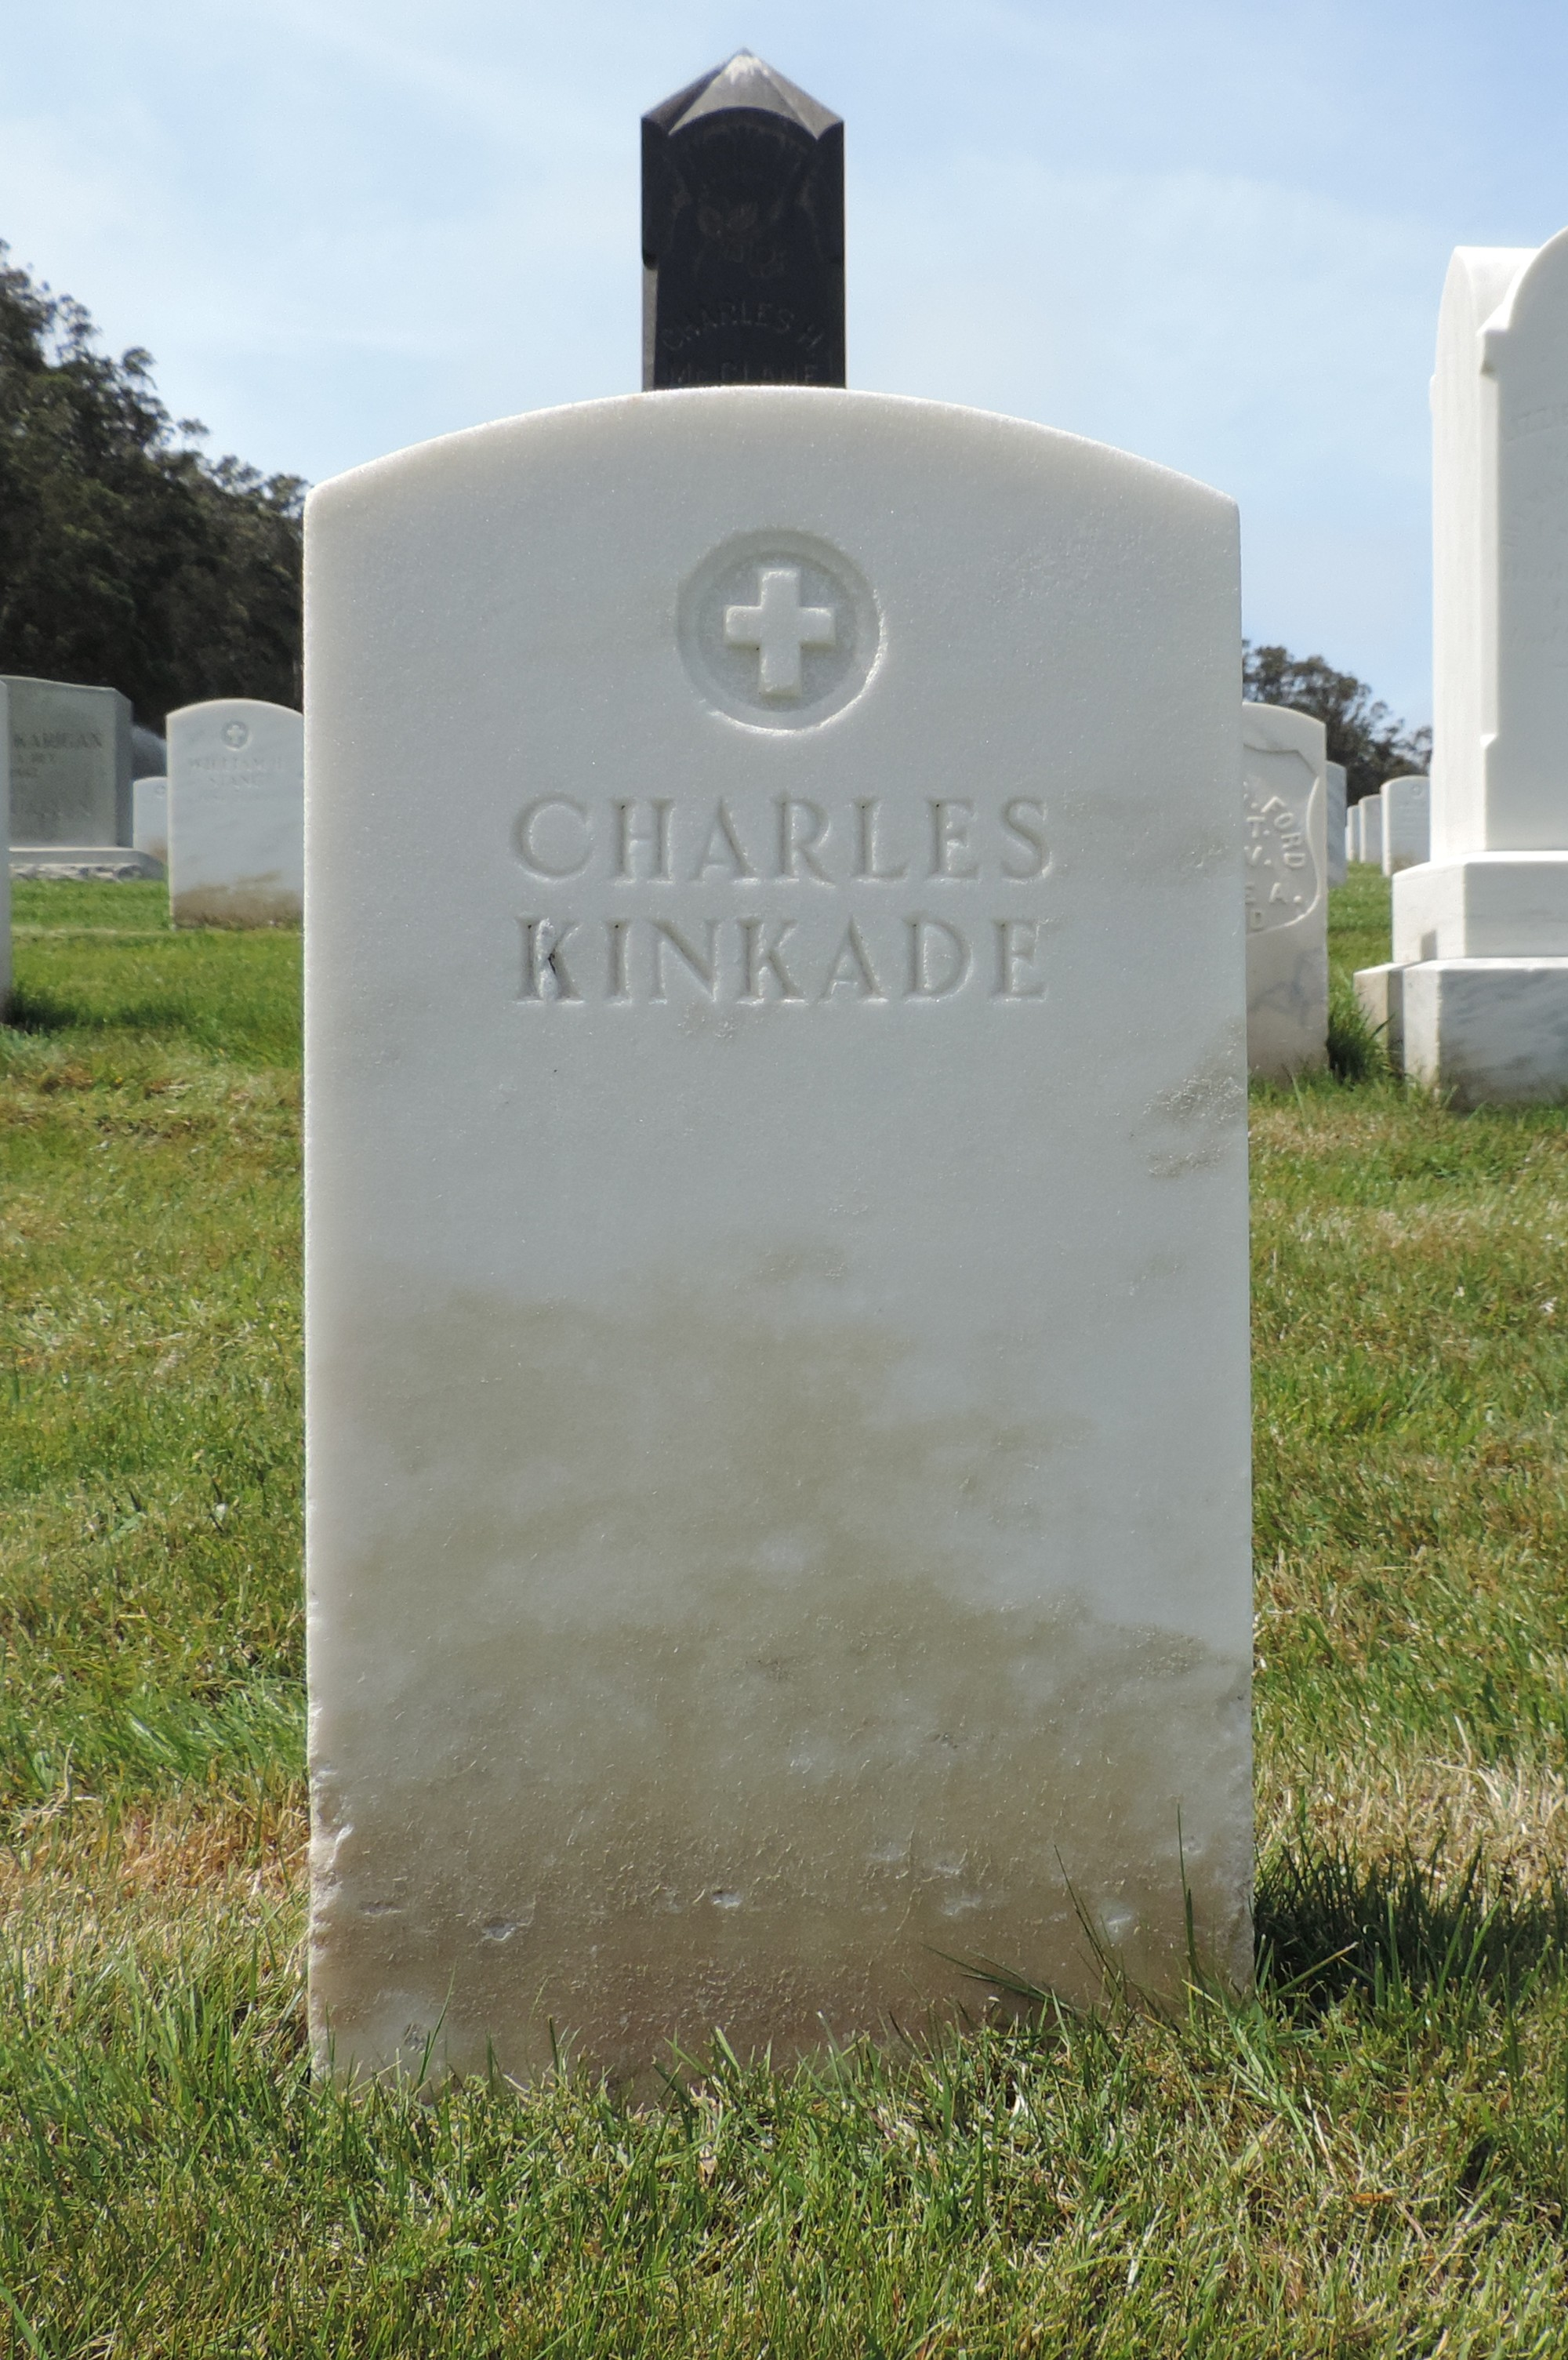 Charles Kinkade